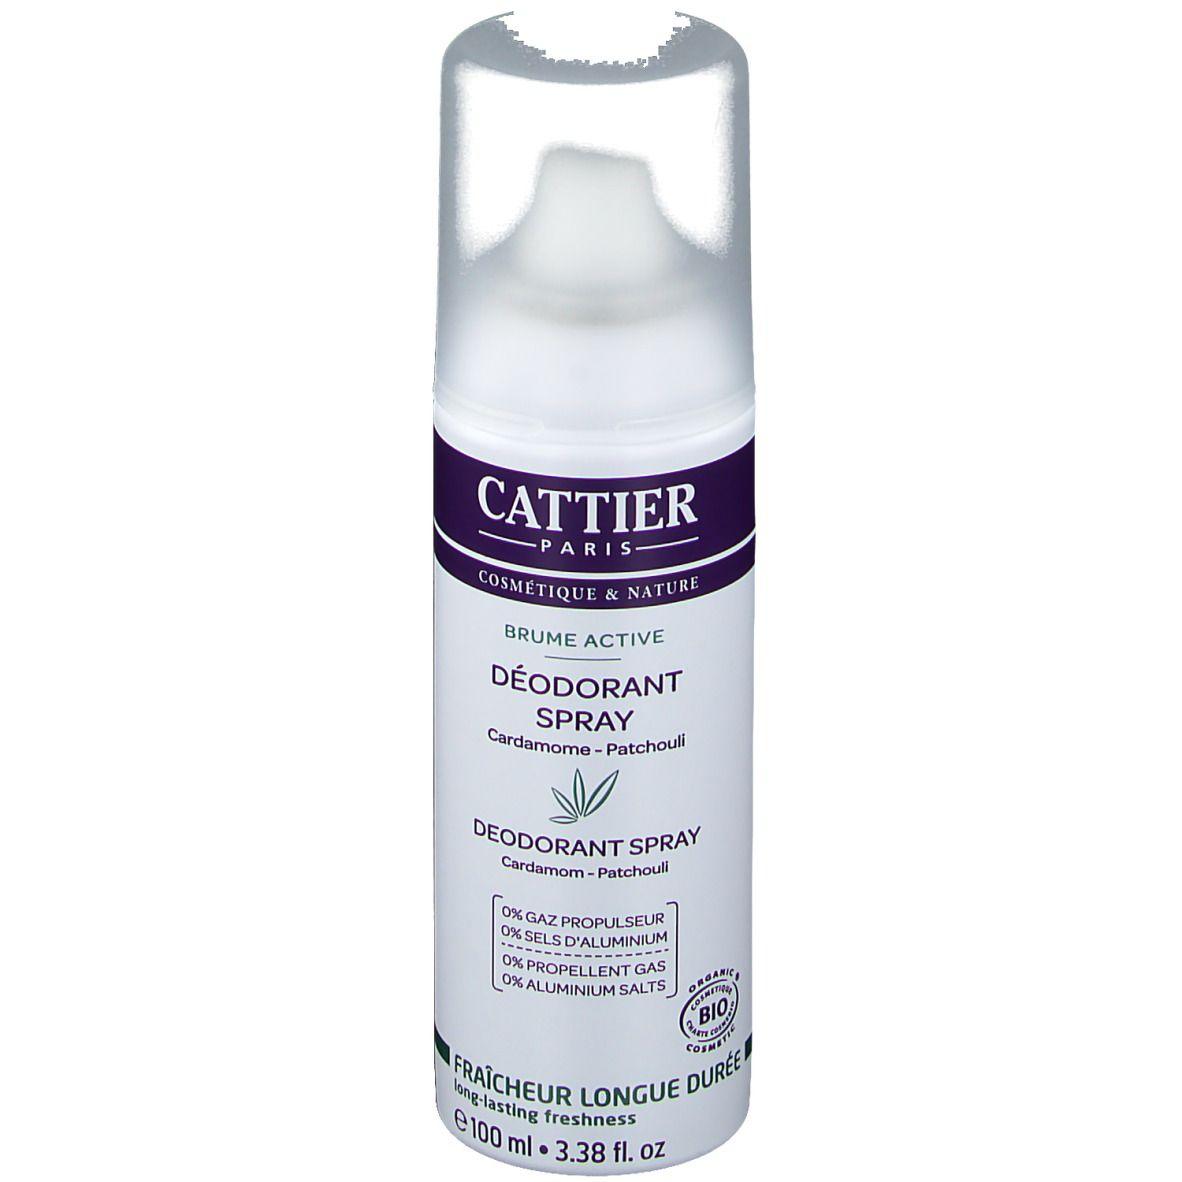 Image of CATTIER Deodorant Brume Active - Kardamom & Patchouli